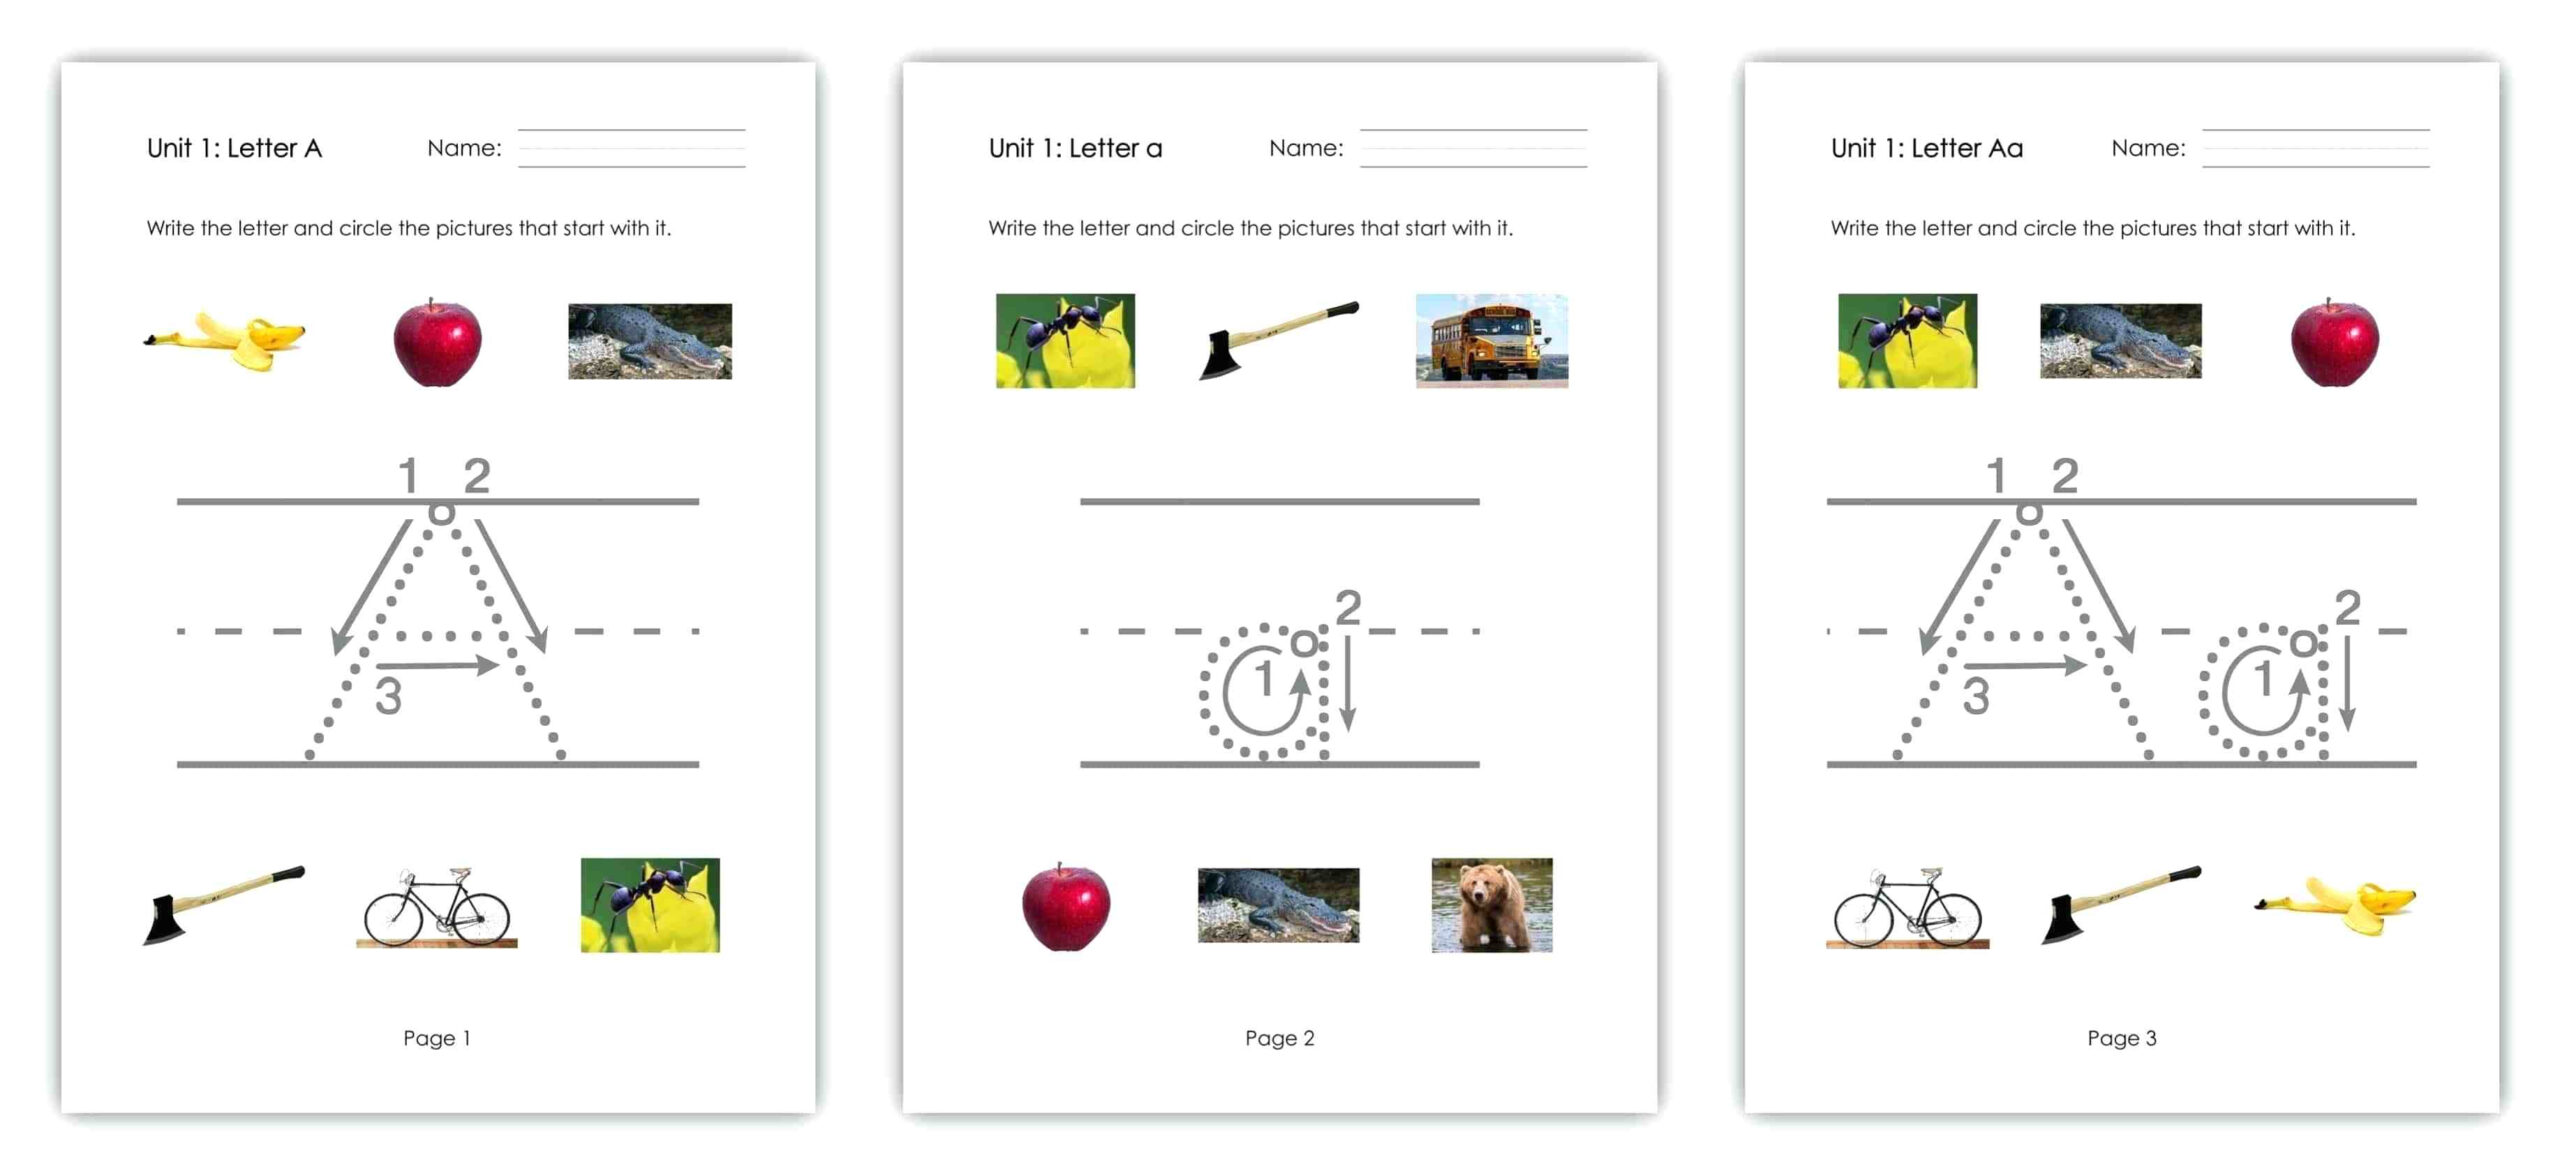 Reading Az Worksheets – Goodwincolor.co regarding Reading A-Z Alphabet Worksheets